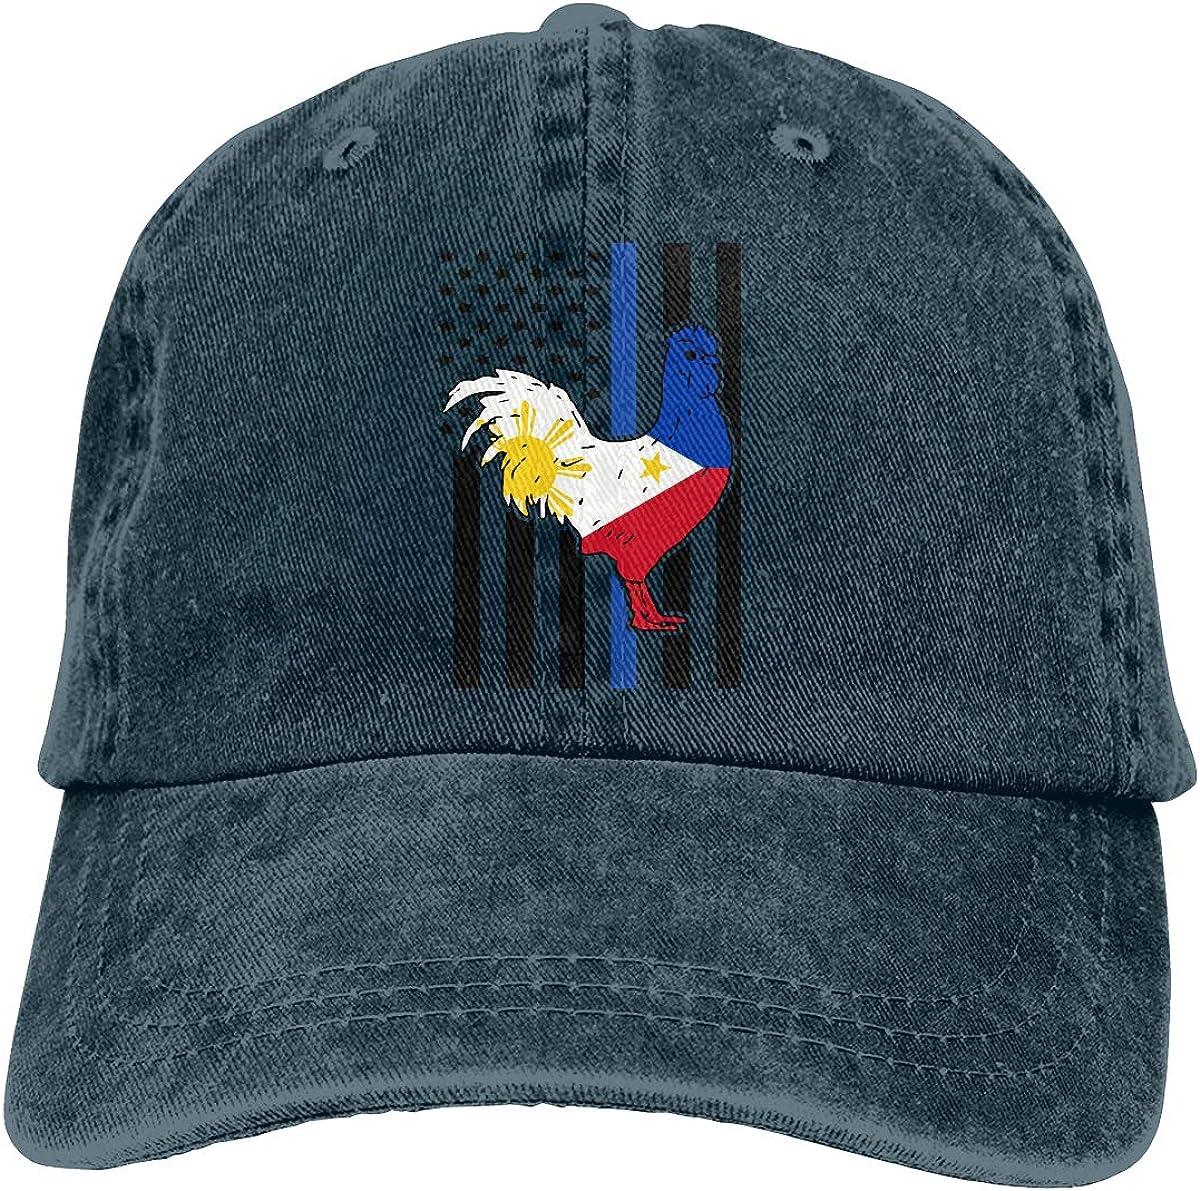 PMGM-C Philippines Flag Rooster Blue Thin Line Flag Adult Trendy Denim Hip Hop Cap Adjustable Baseball Cap